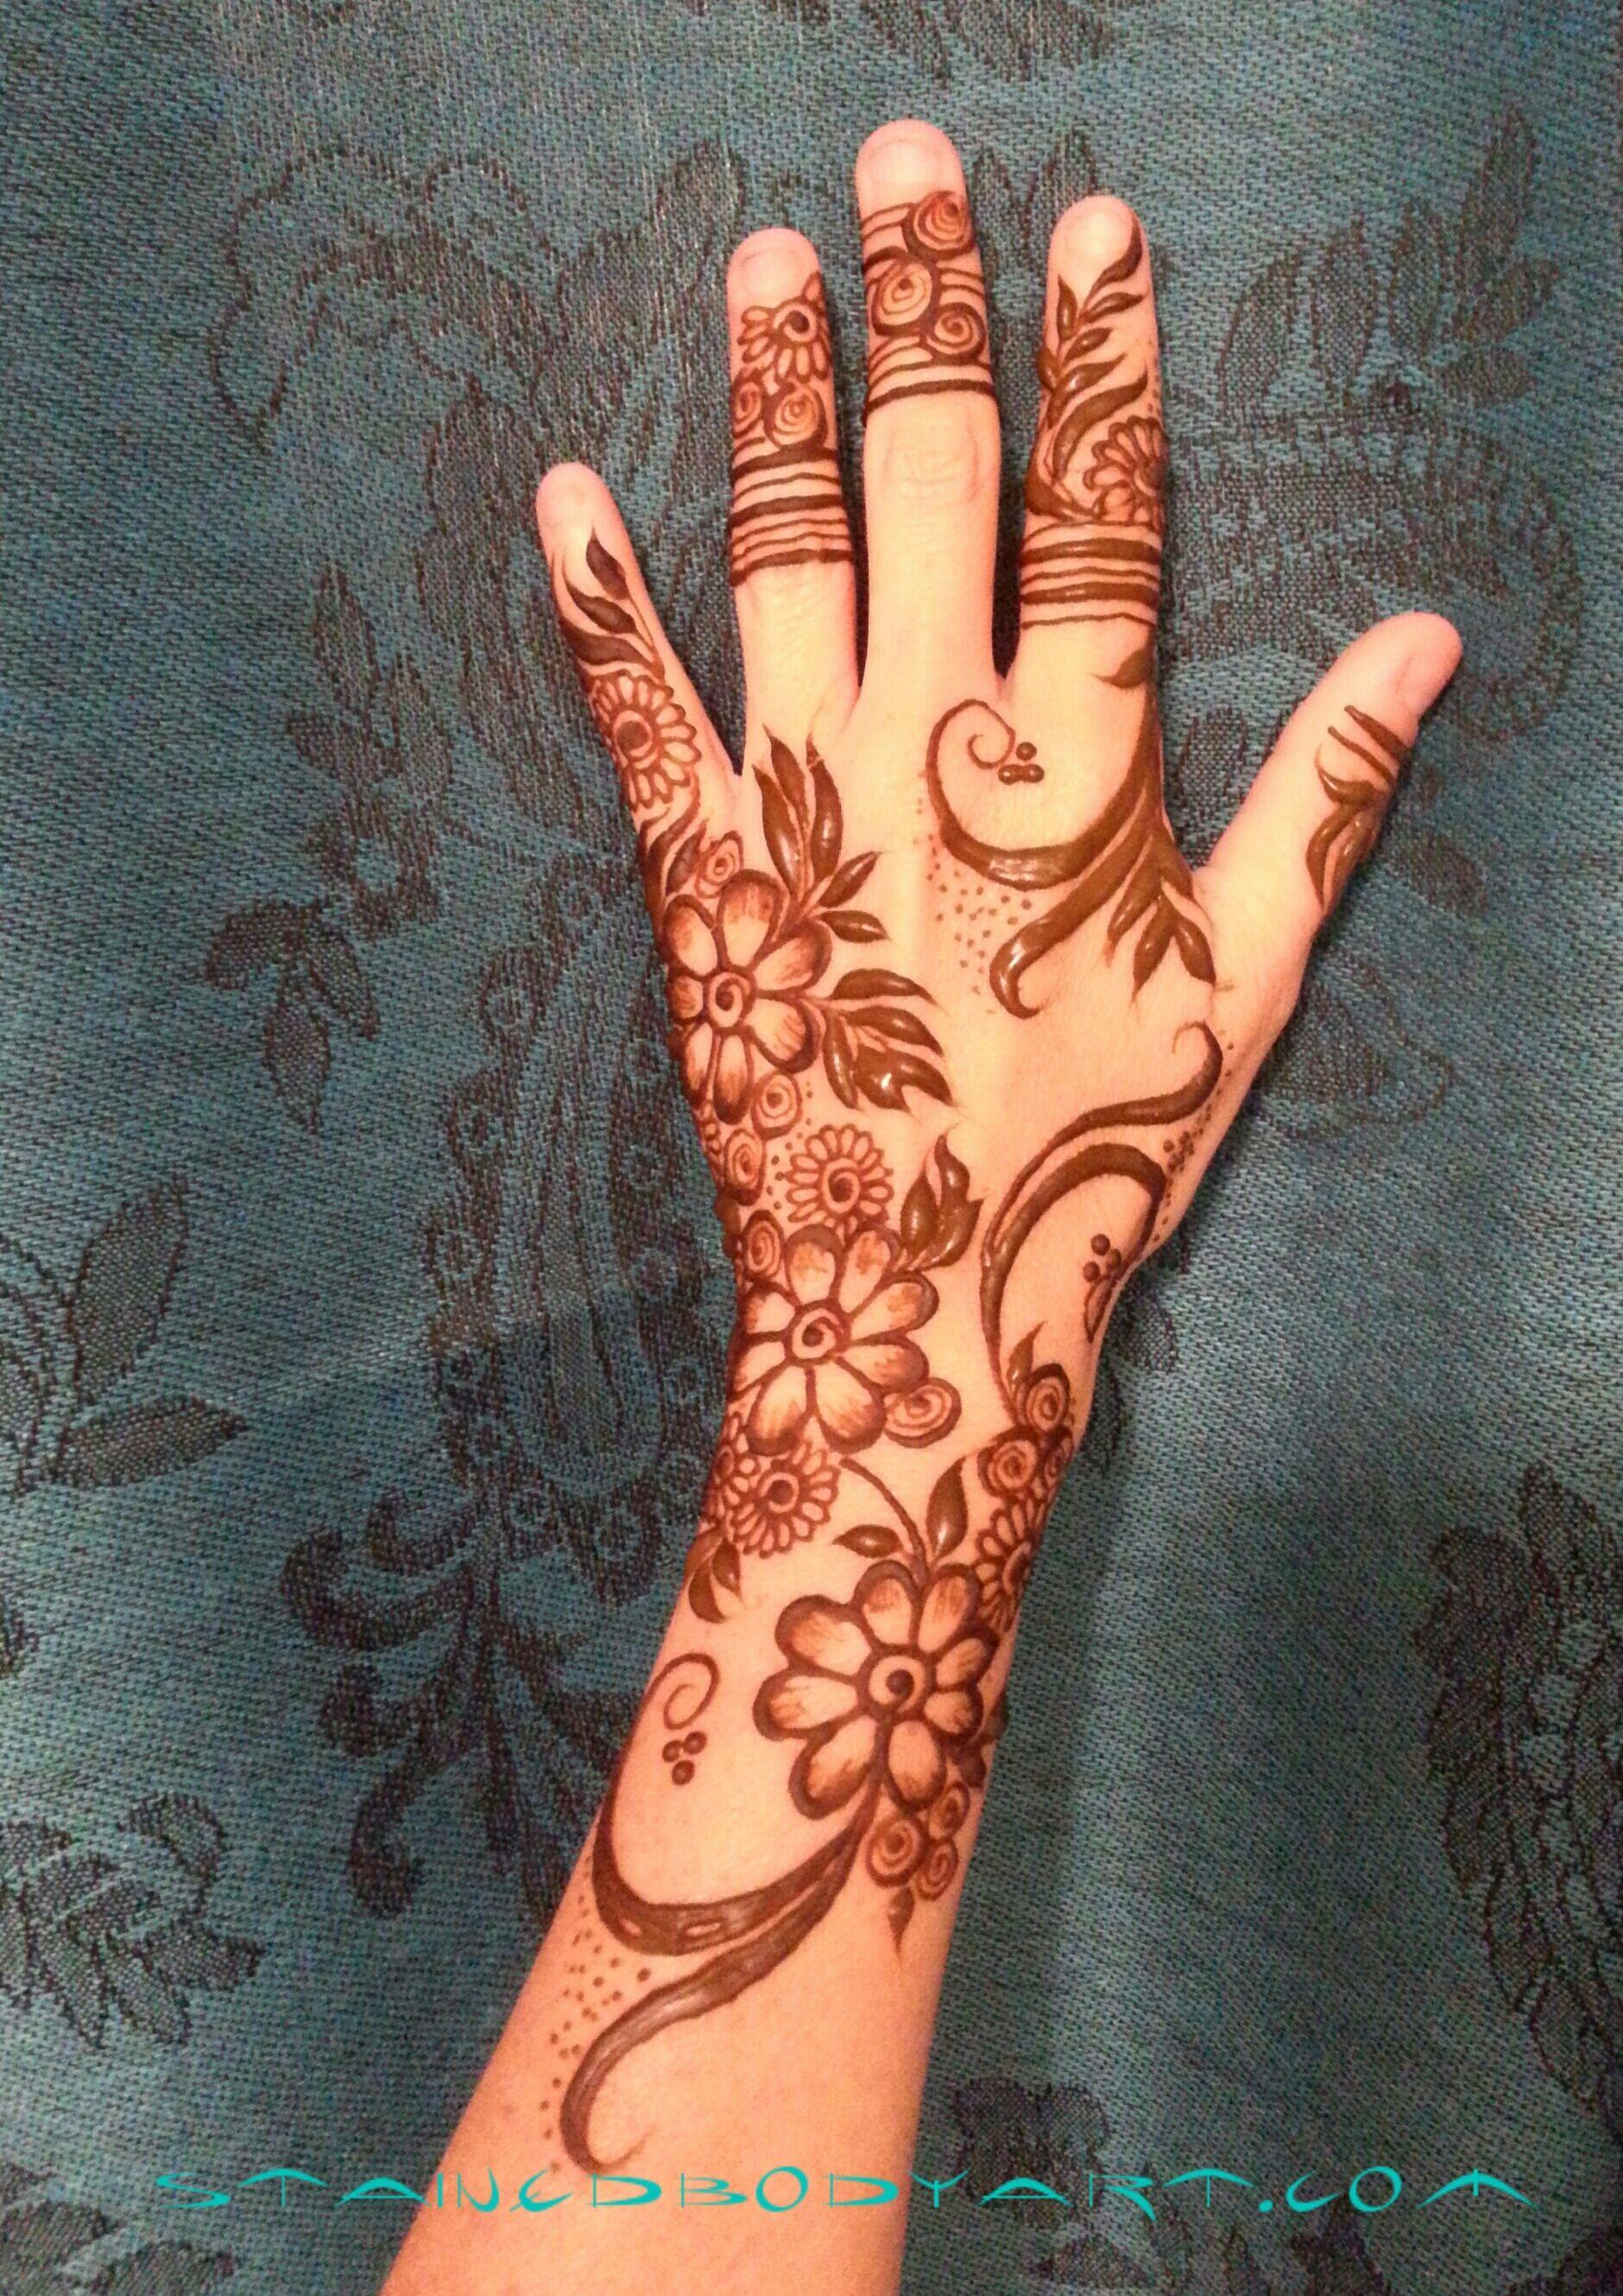 Gulf khaleeji style henna mehndi girly enna unique designs also de  lovely rh ar pinterest